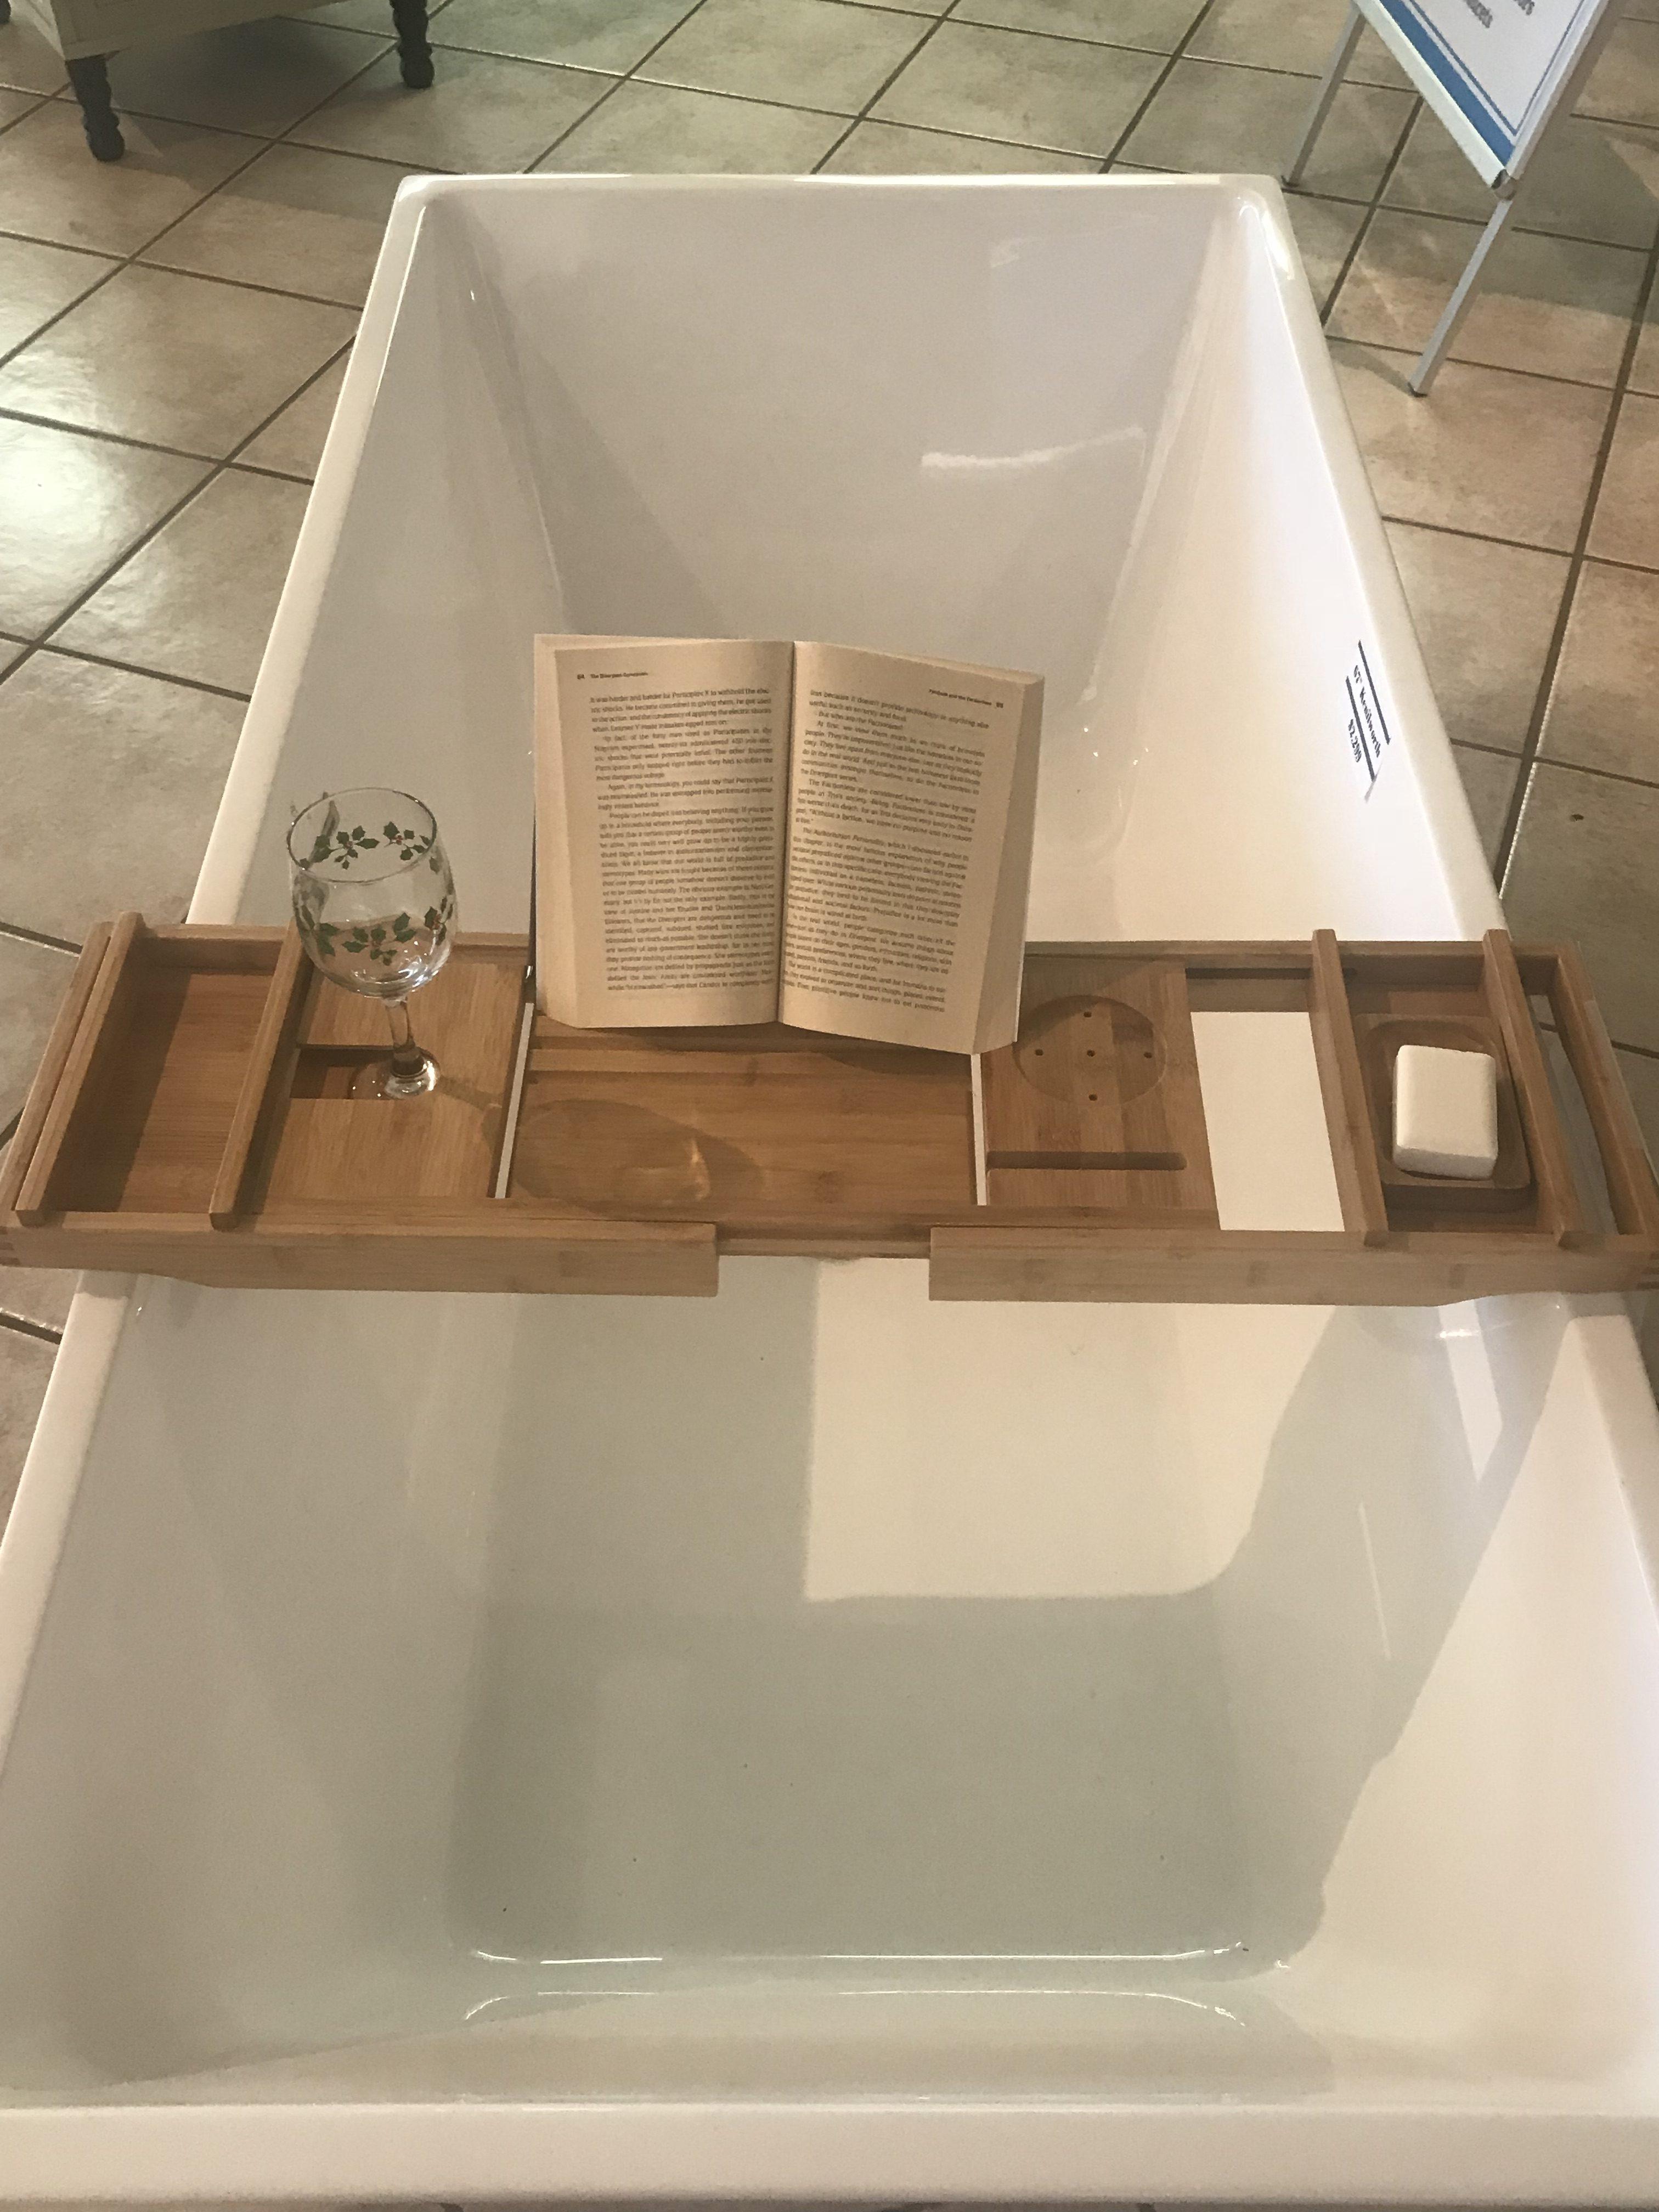 Expandable Bamboo Bathtub Caddy - Best Bathtub 2018